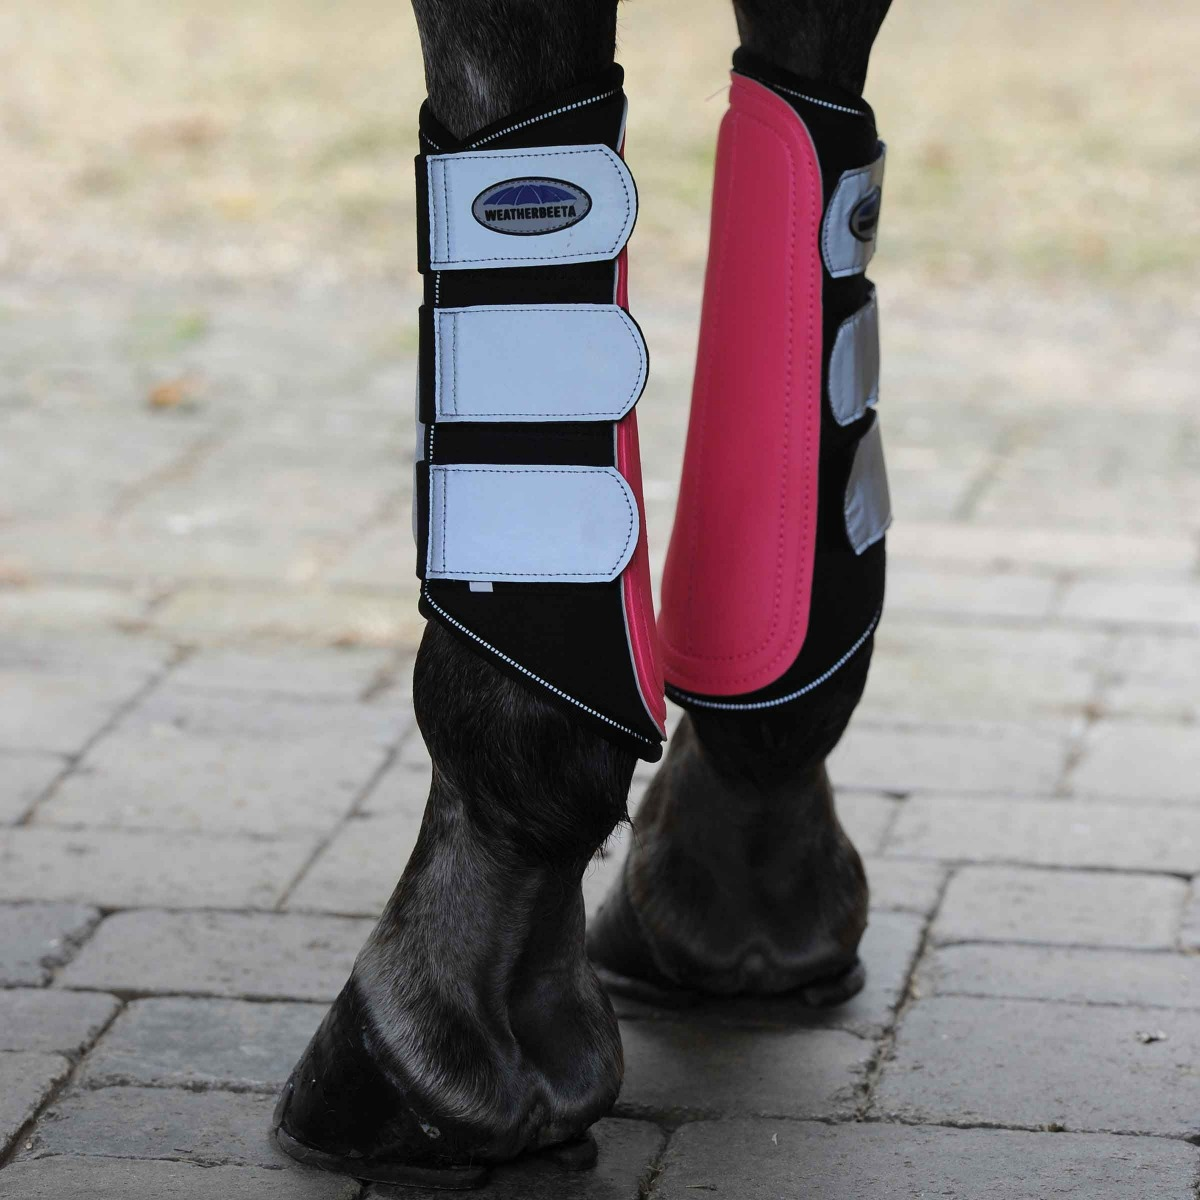 weatherbeeta reflective single lock brushing boots